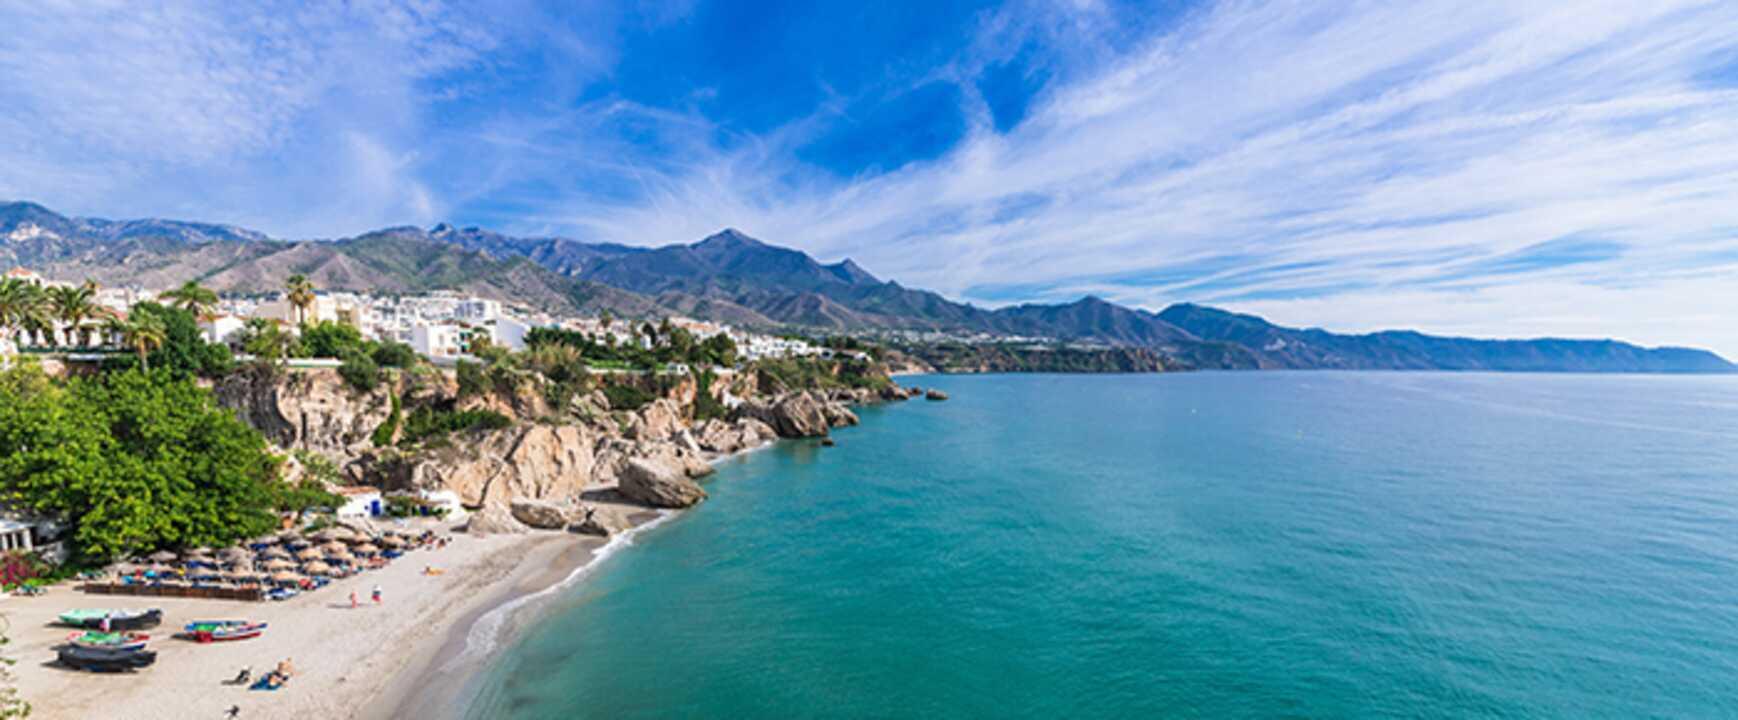 Best Beaches Near Costa Del Sol